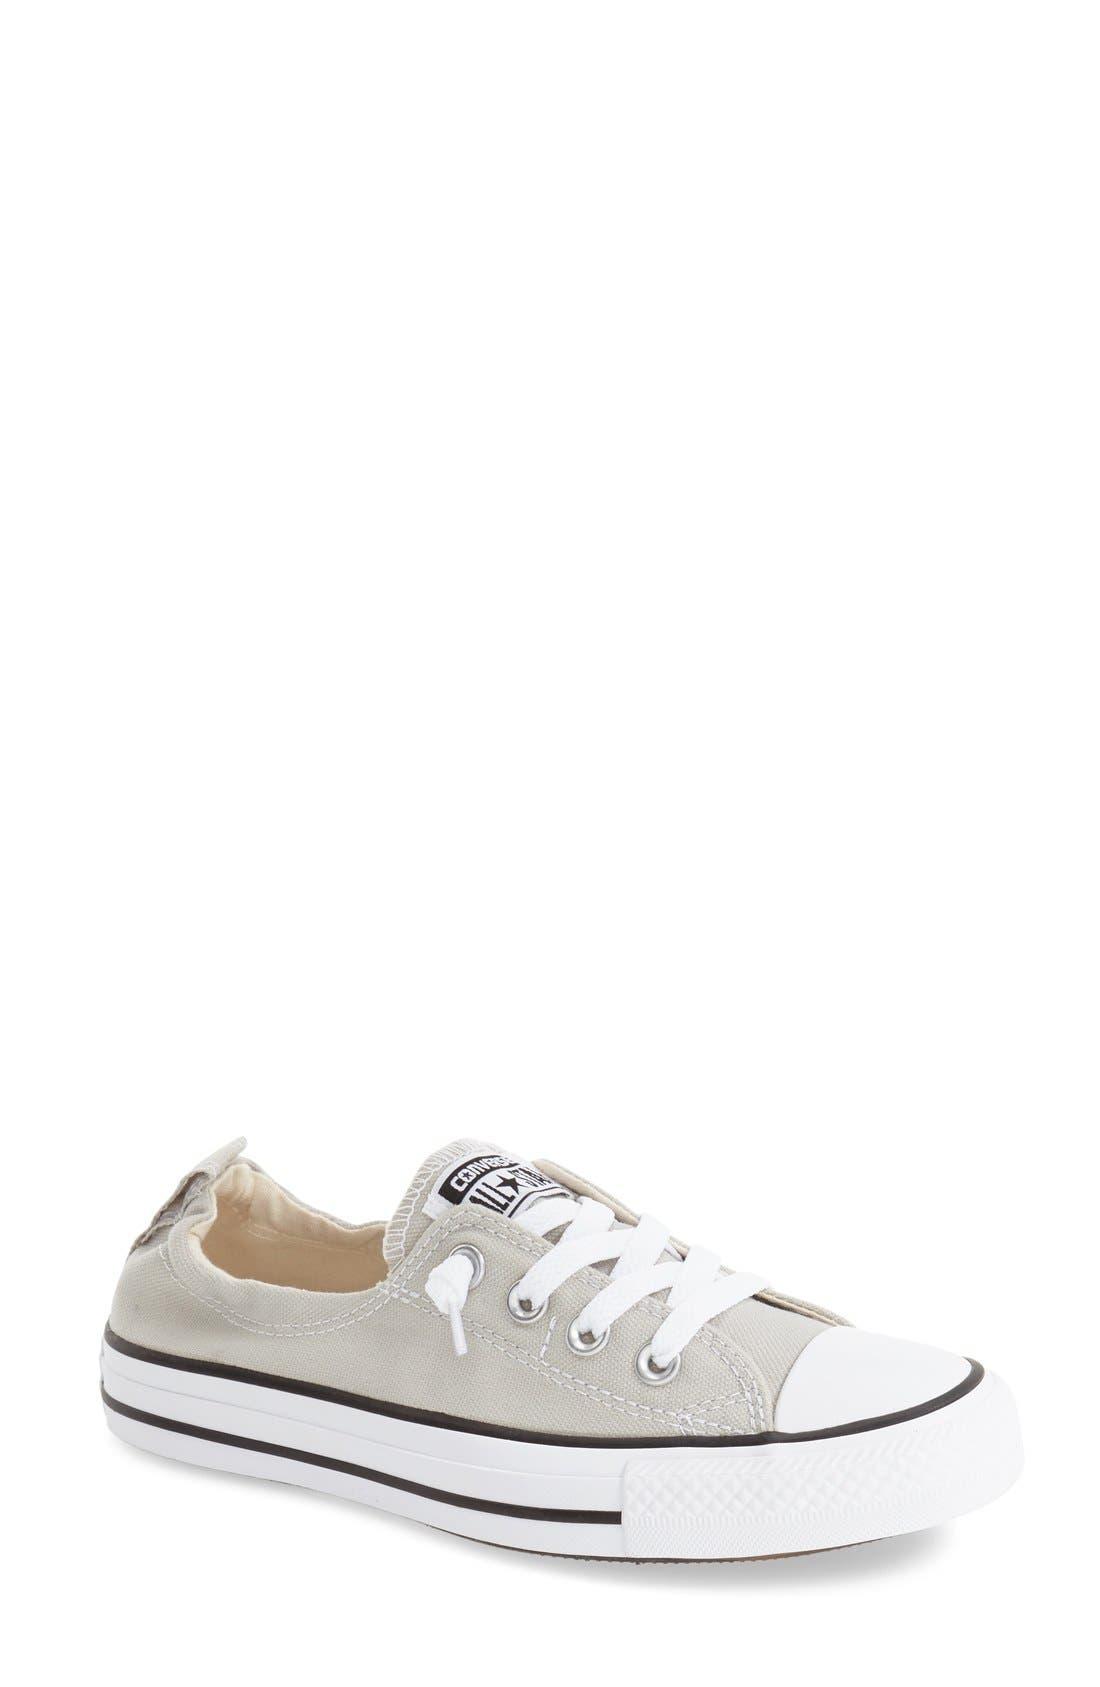 Main Image - Converse Chuck Taylor® 'Shoreline' Sneaker (Women)